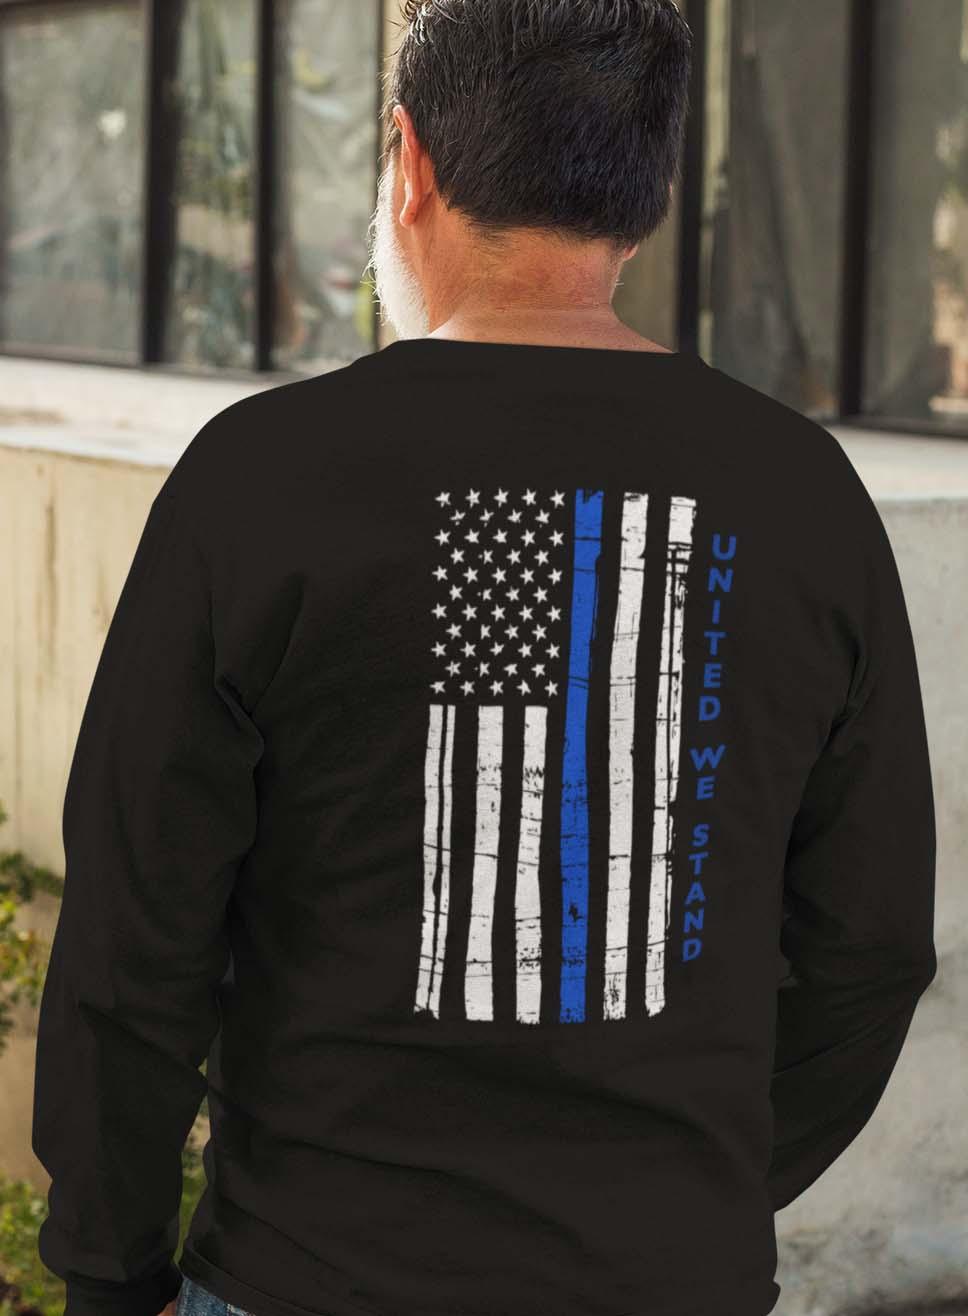 t-shirt united we stand on black back long sleeves men's